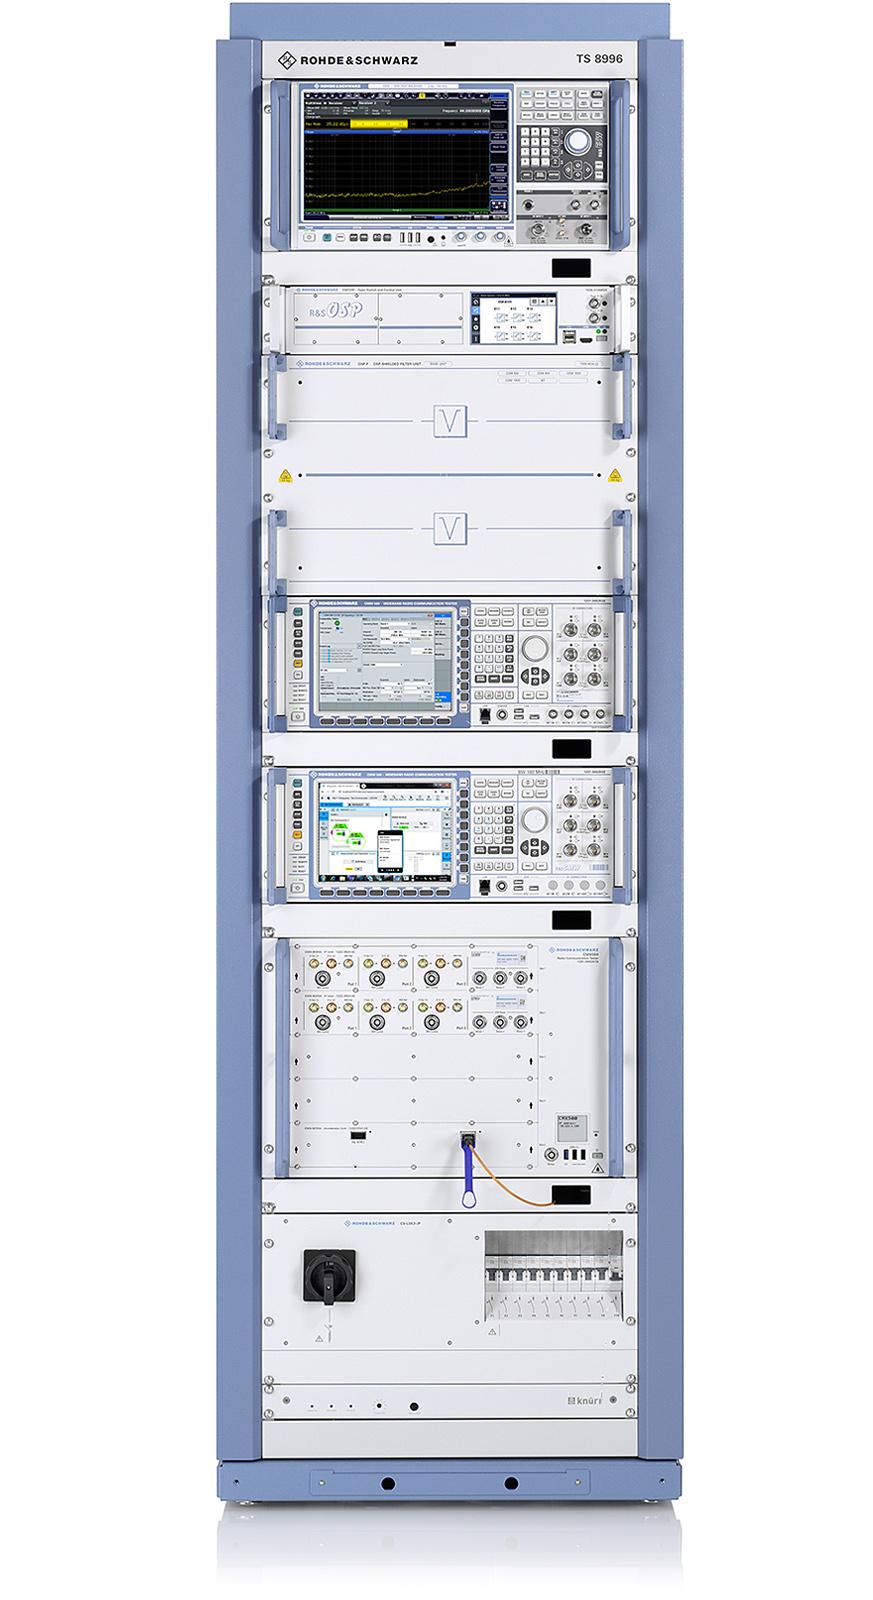 Test-measurement-wireless-communications-ts8996-rse-test-system_50716_01_start.jpg